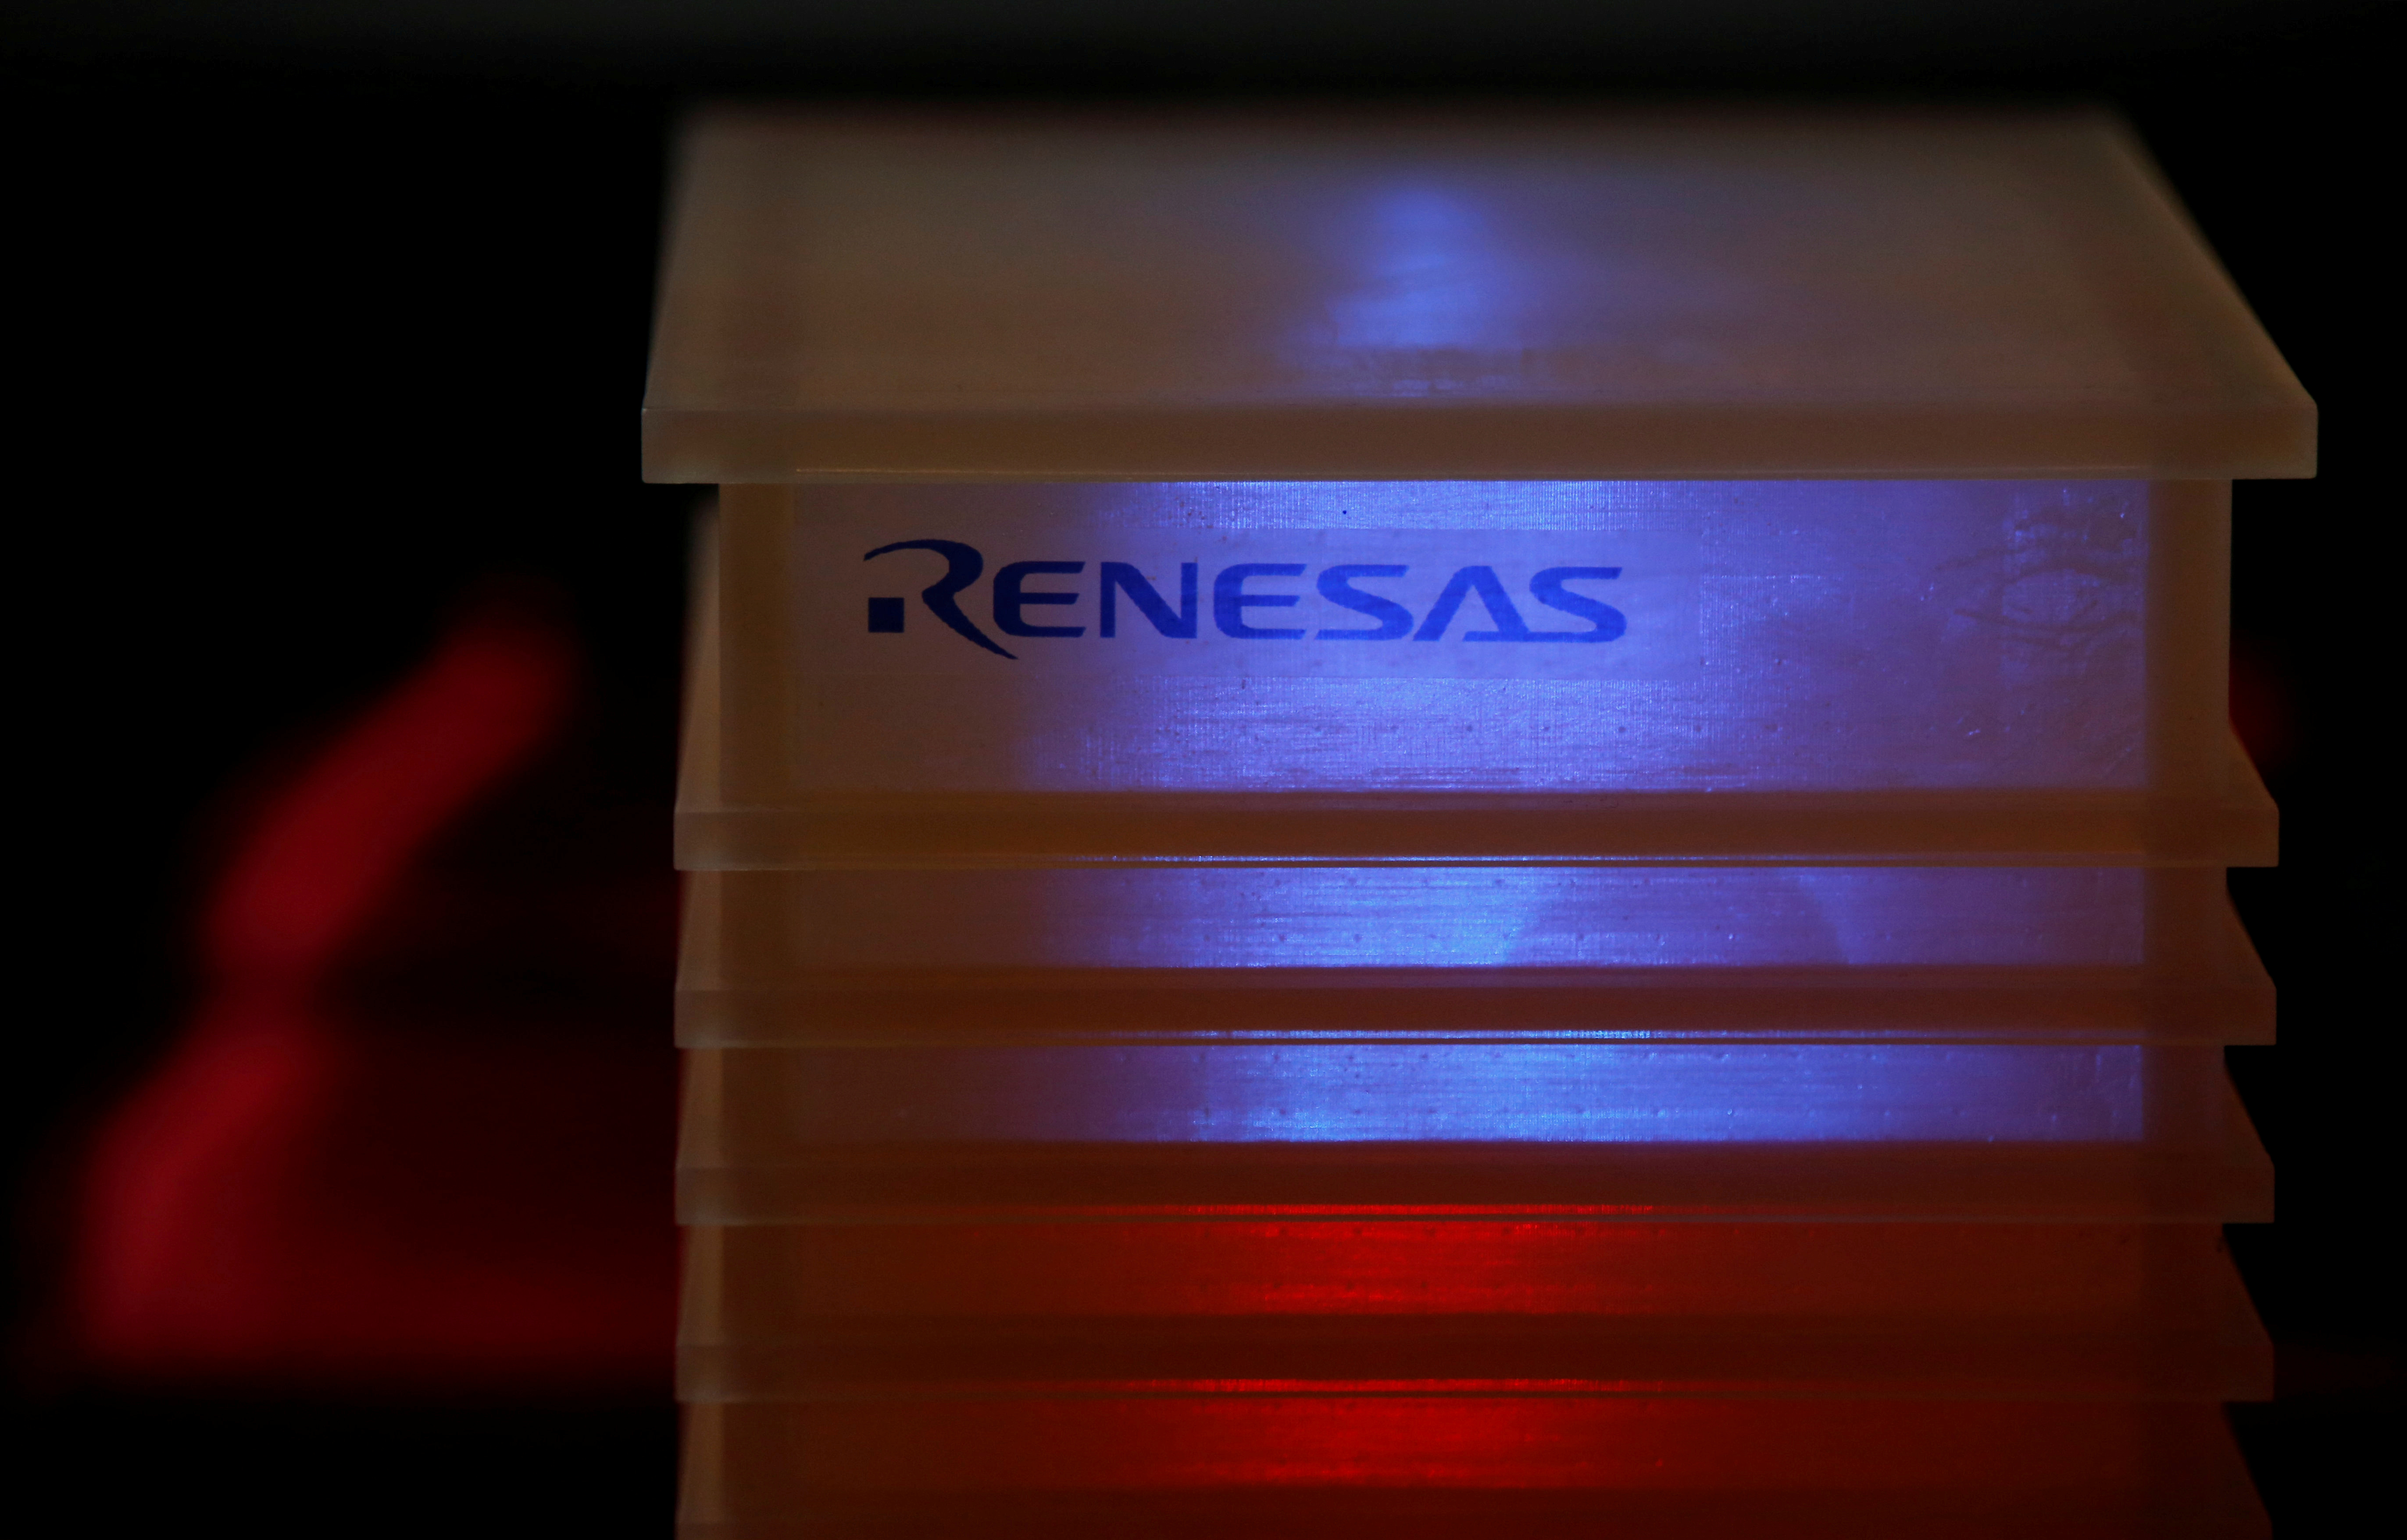 Renesas Electronics Corp's logo is seen at a company conference in Tokyo, Japan, April 11, 2017. REUTERS/Toru Hanai